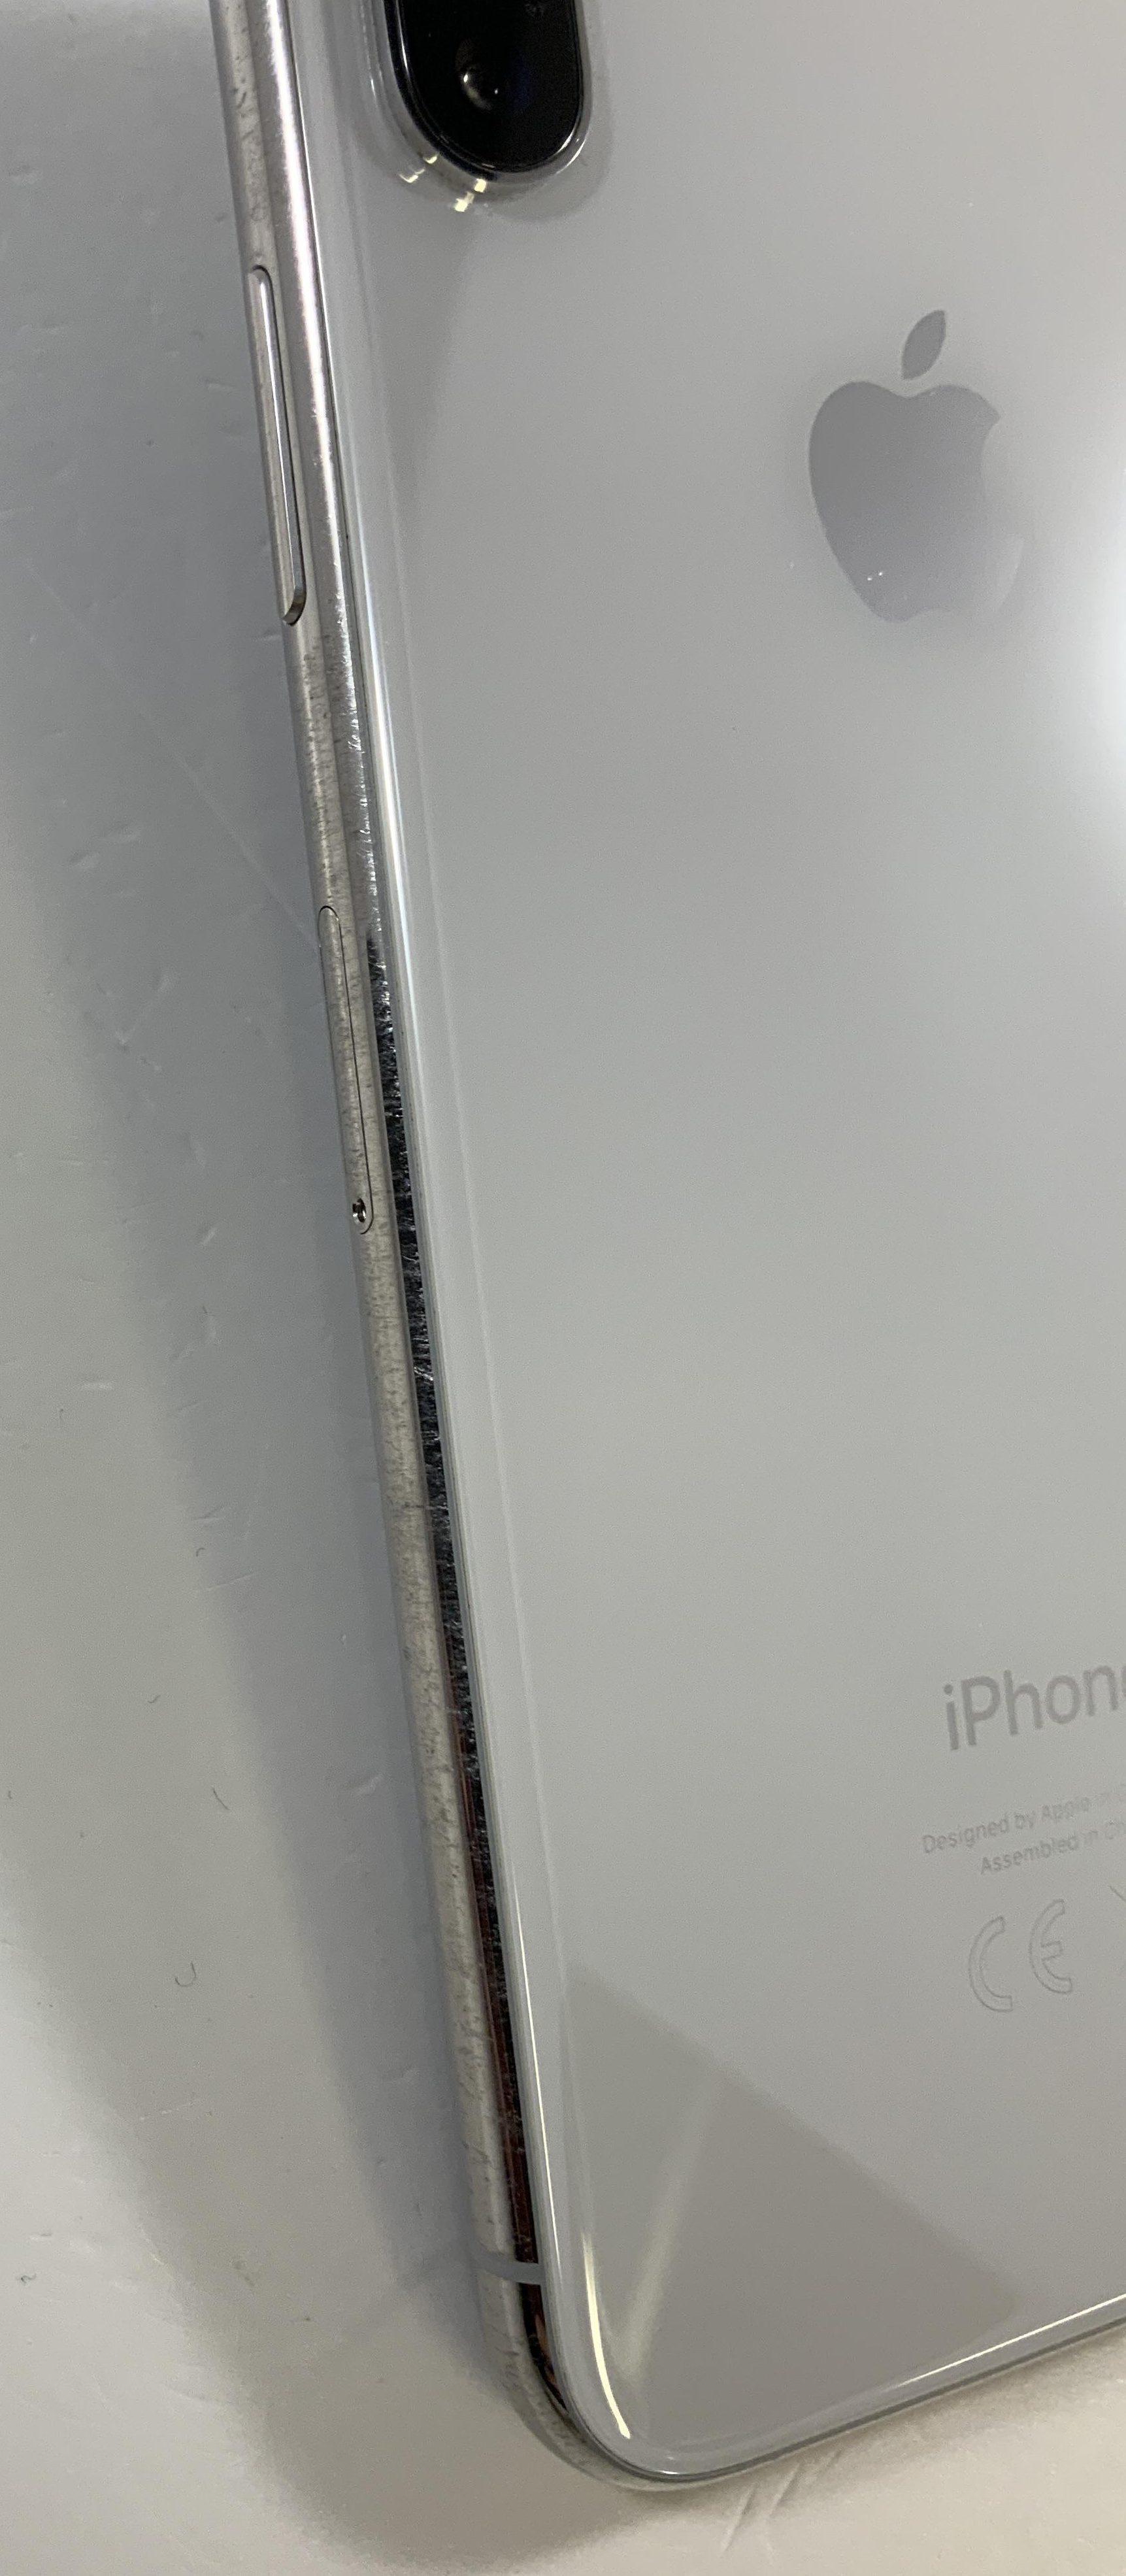 iPhone X 64GB, 64GB, Silver, Bild 4